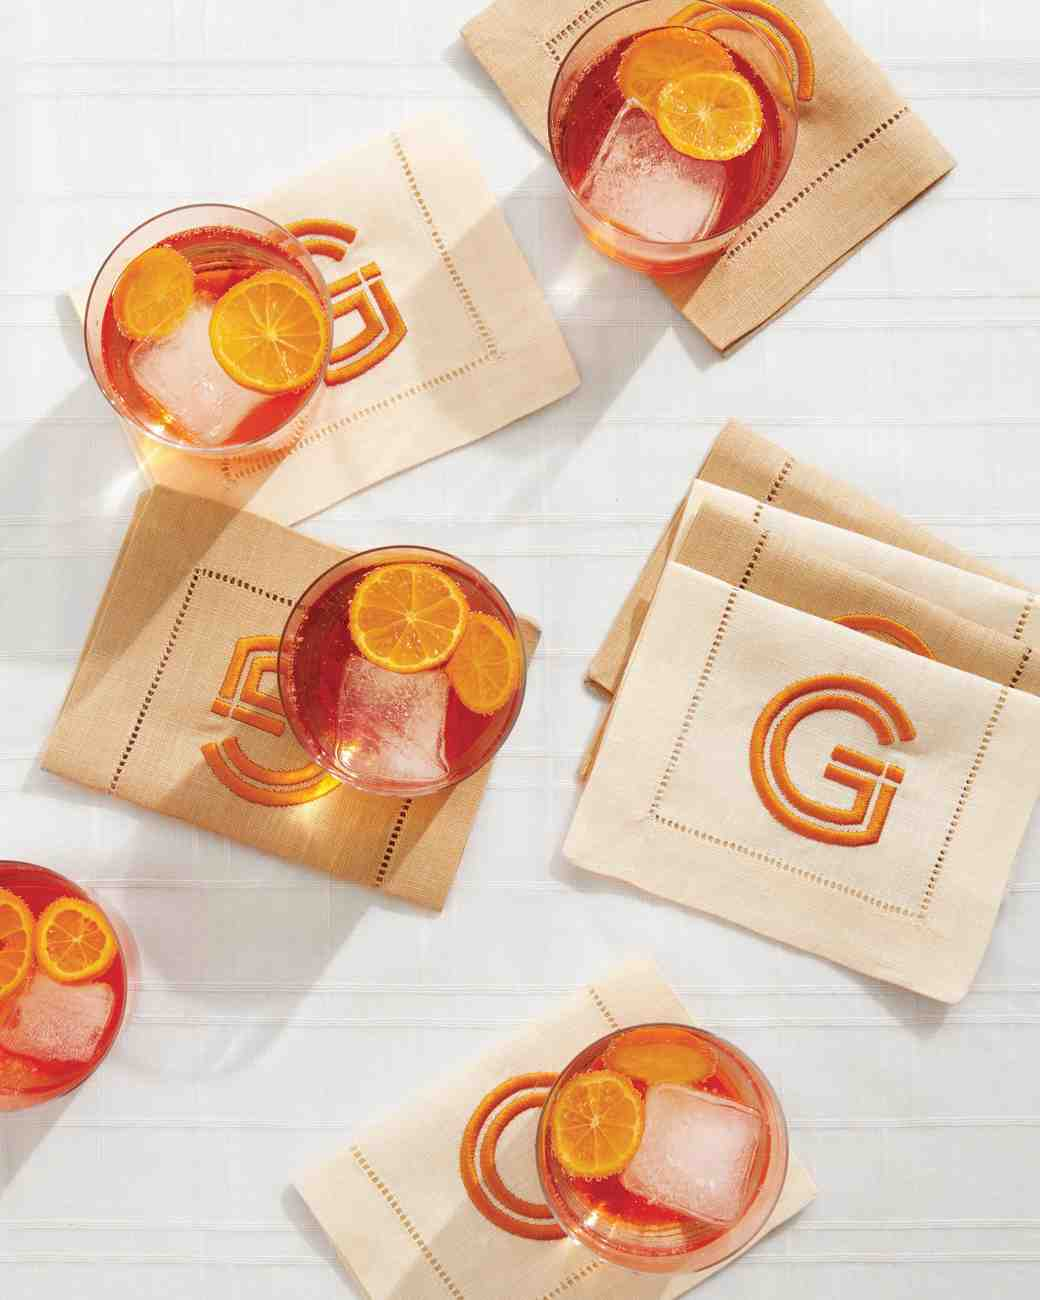 aperol-spritz-tangerine-flax-color-palette-0201-d112892_vert.jpg